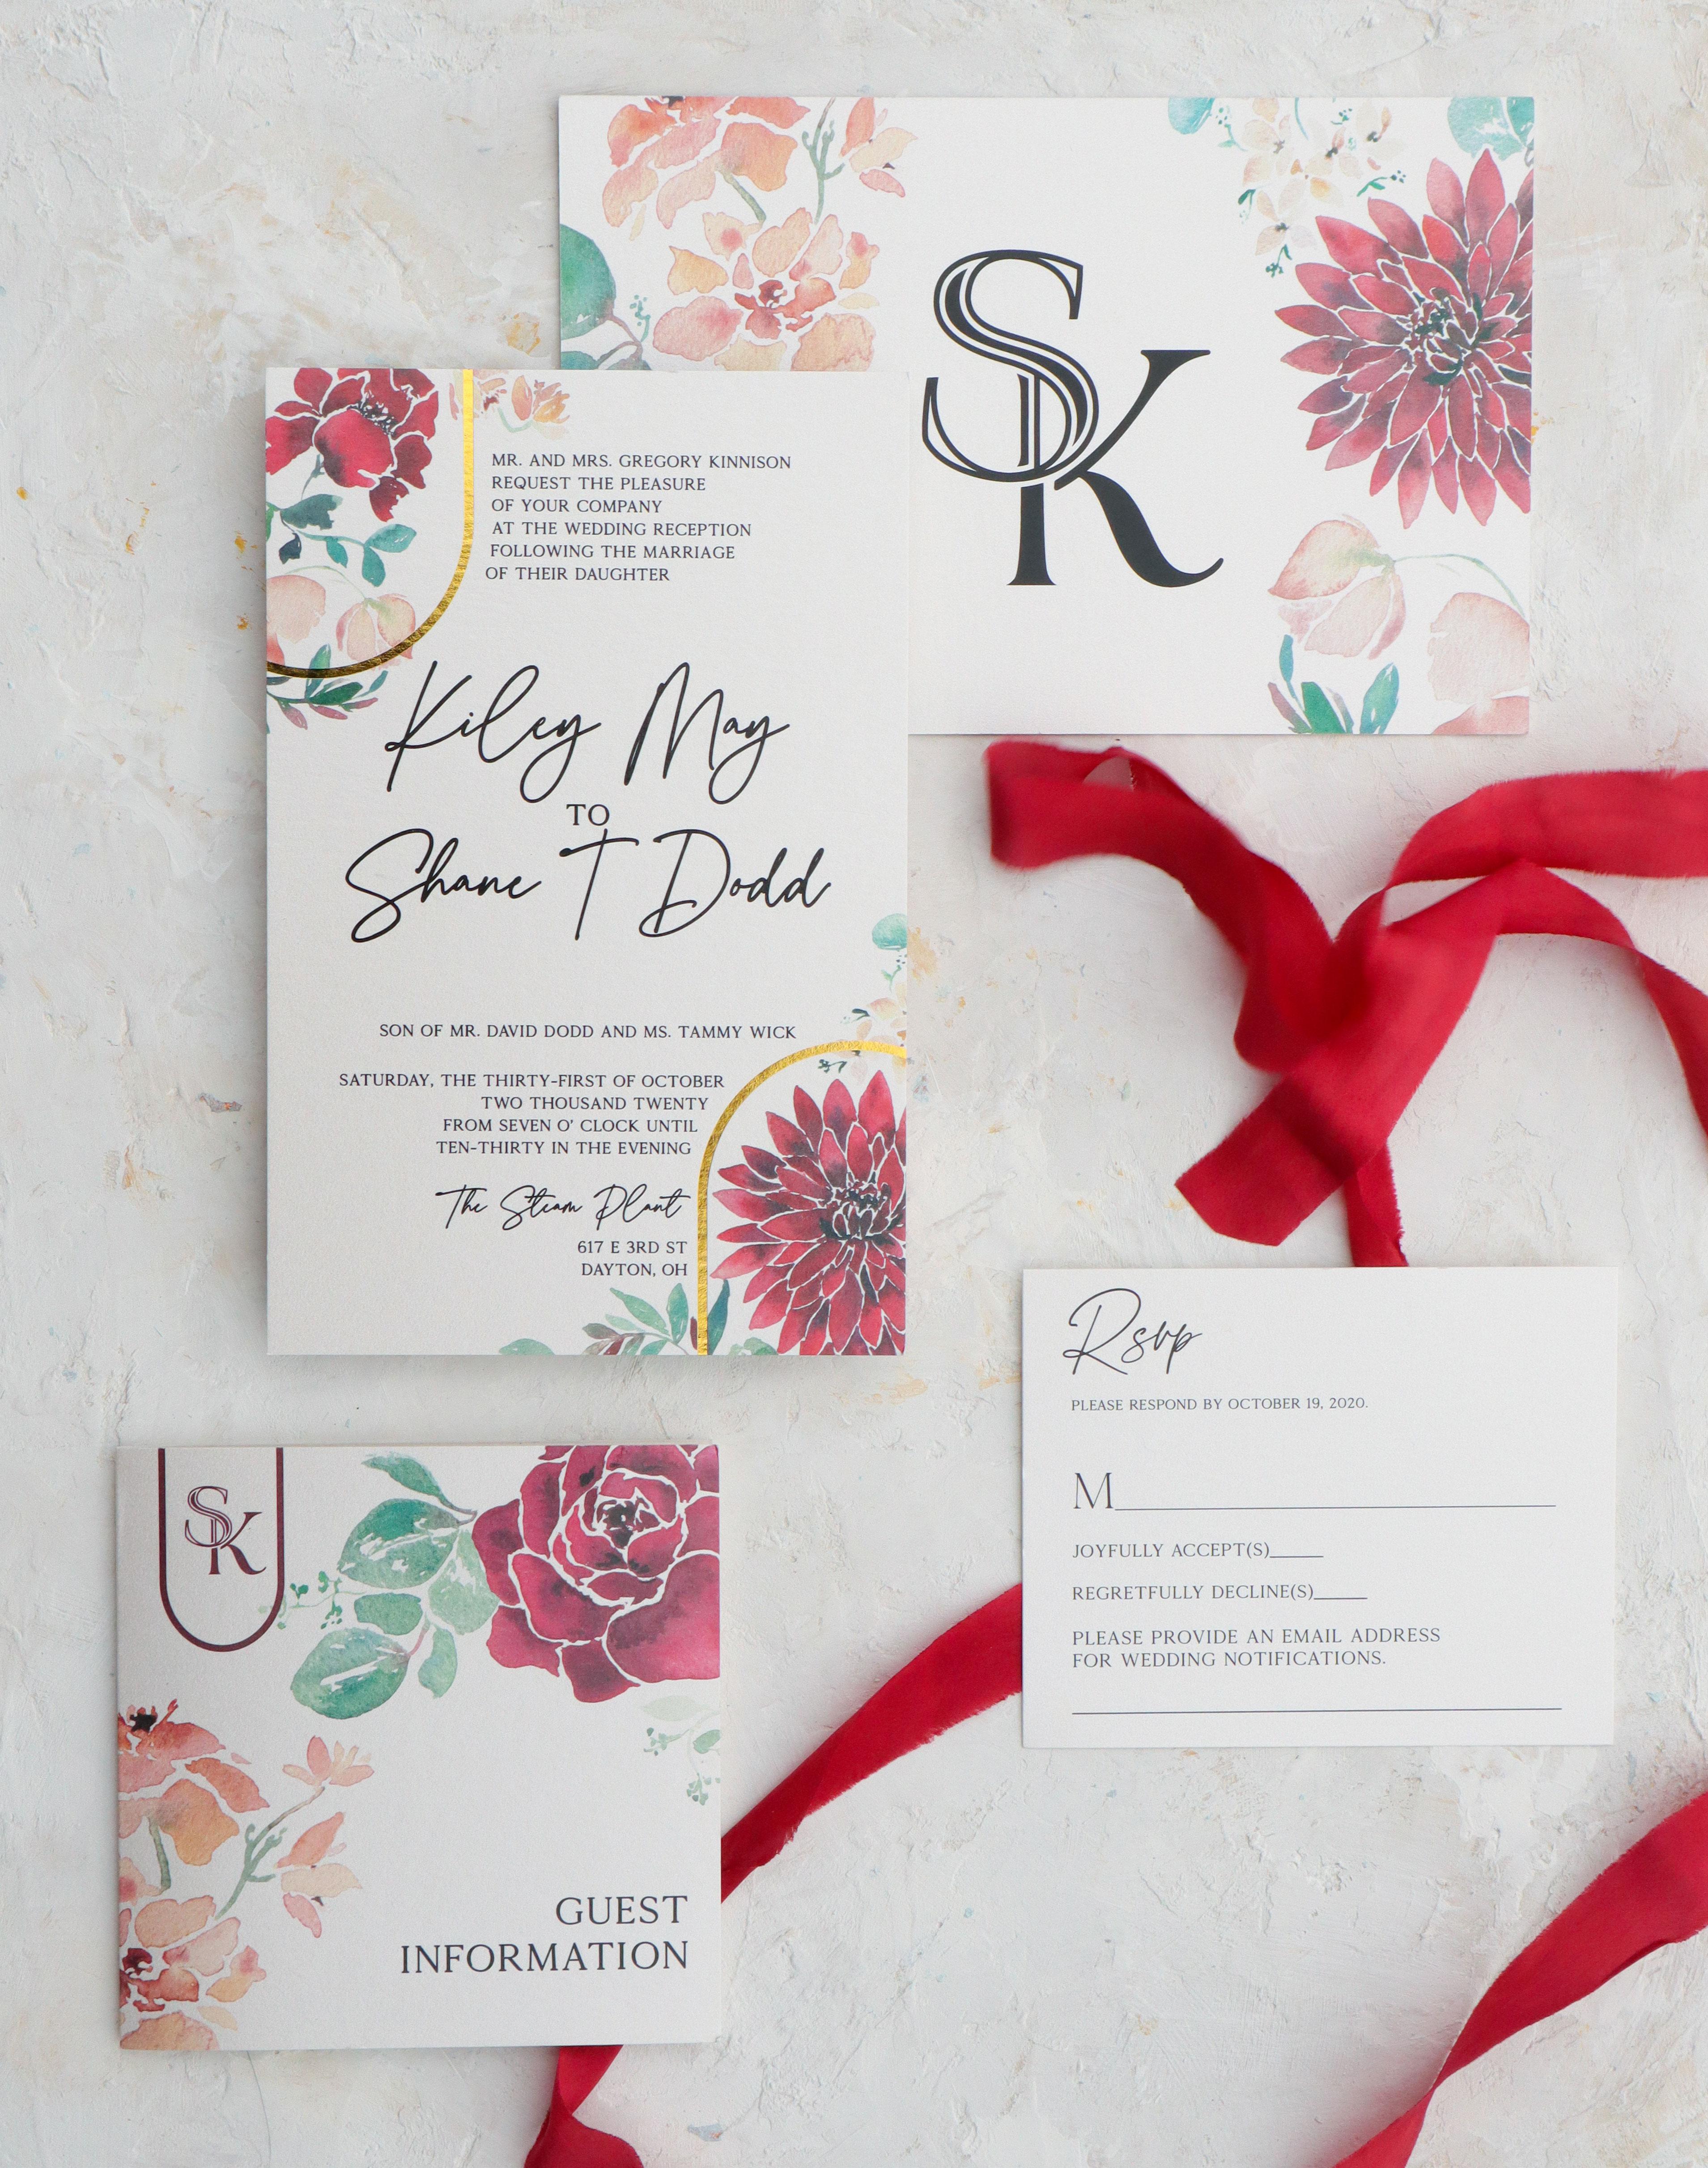 Burgundy wedding invitation with foil arches